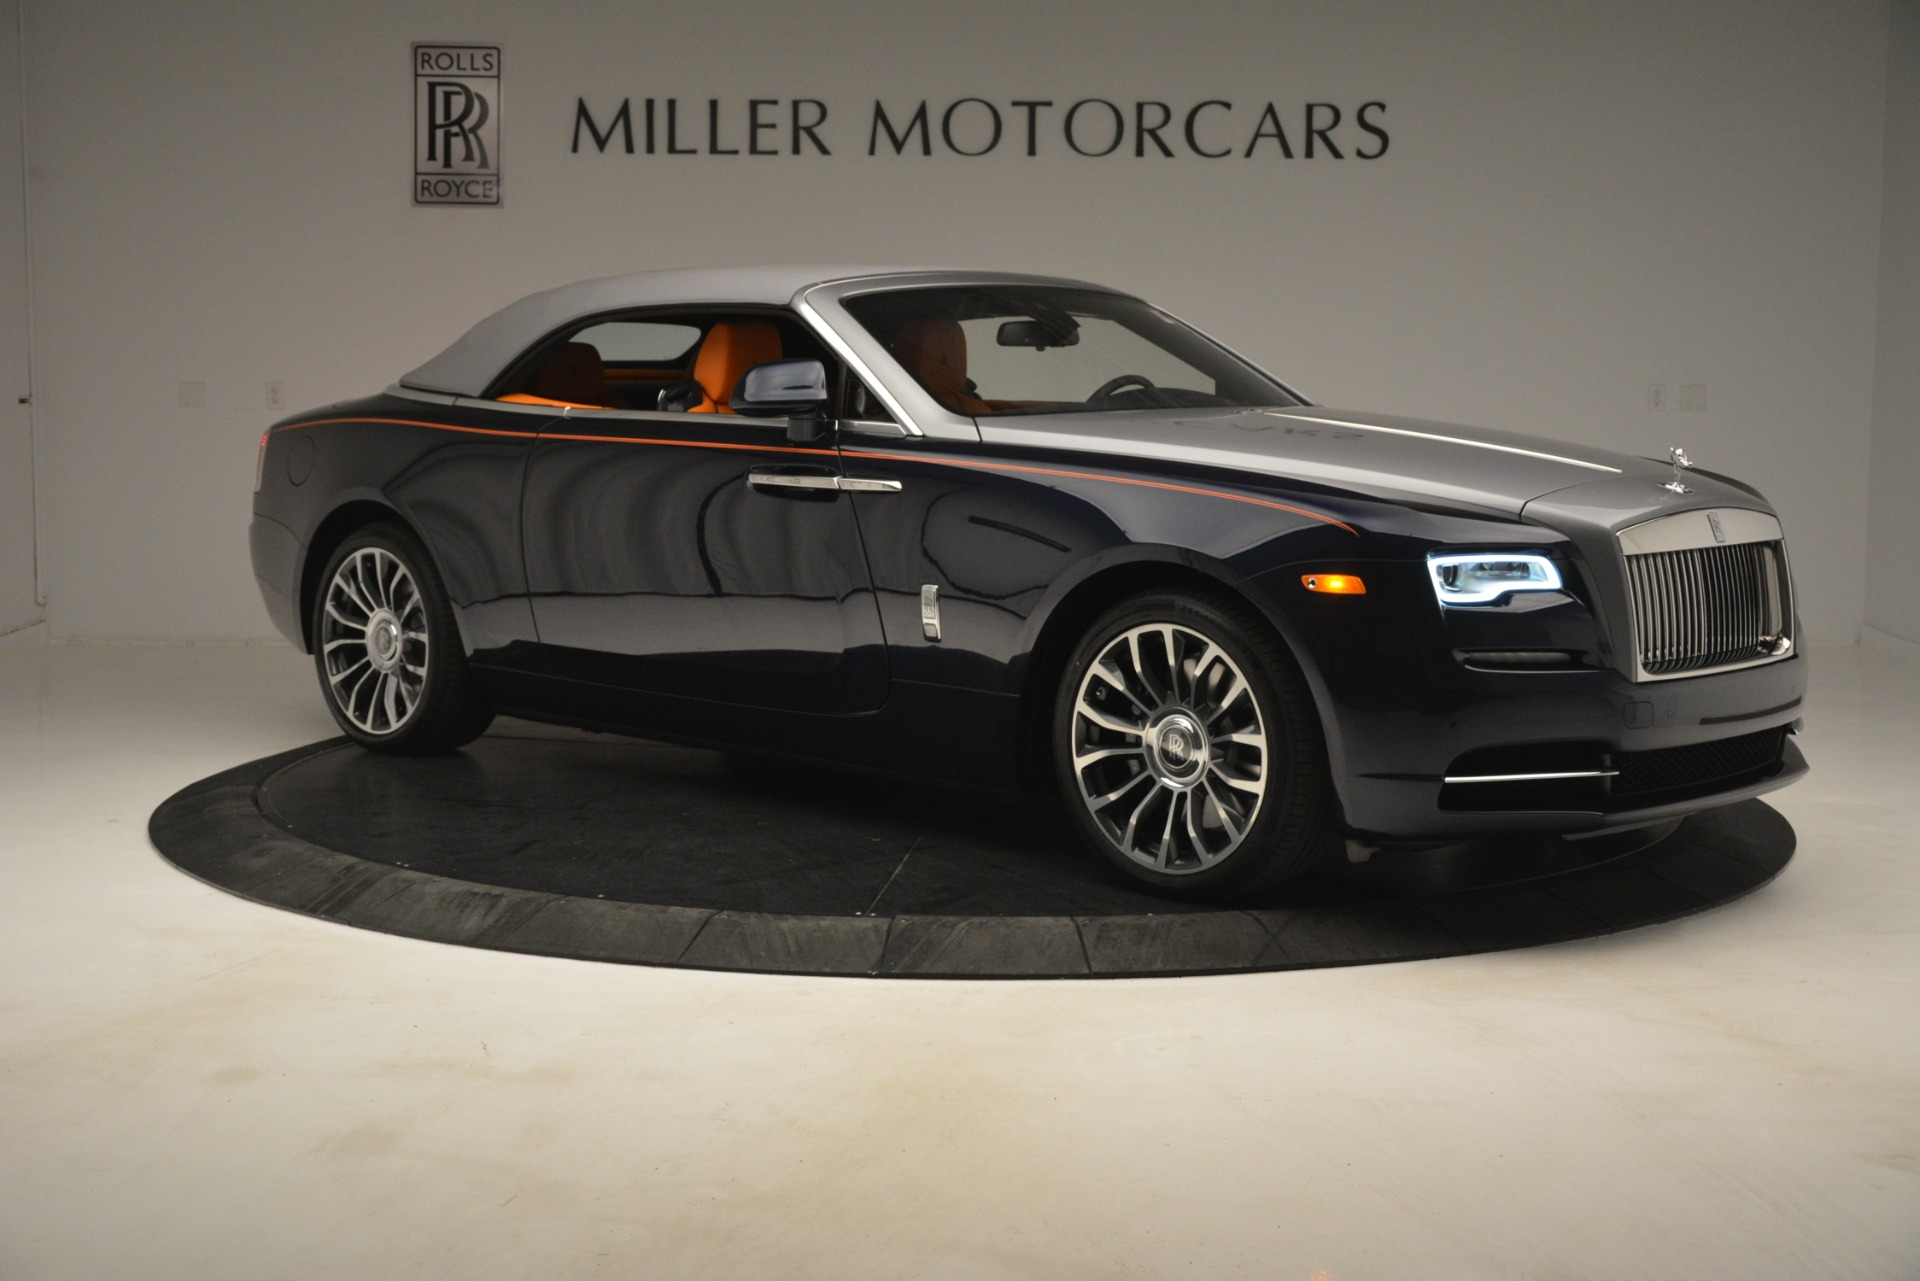 New 2019 Rolls-Royce Dawn  For Sale In Greenwich, CT 2701_p46